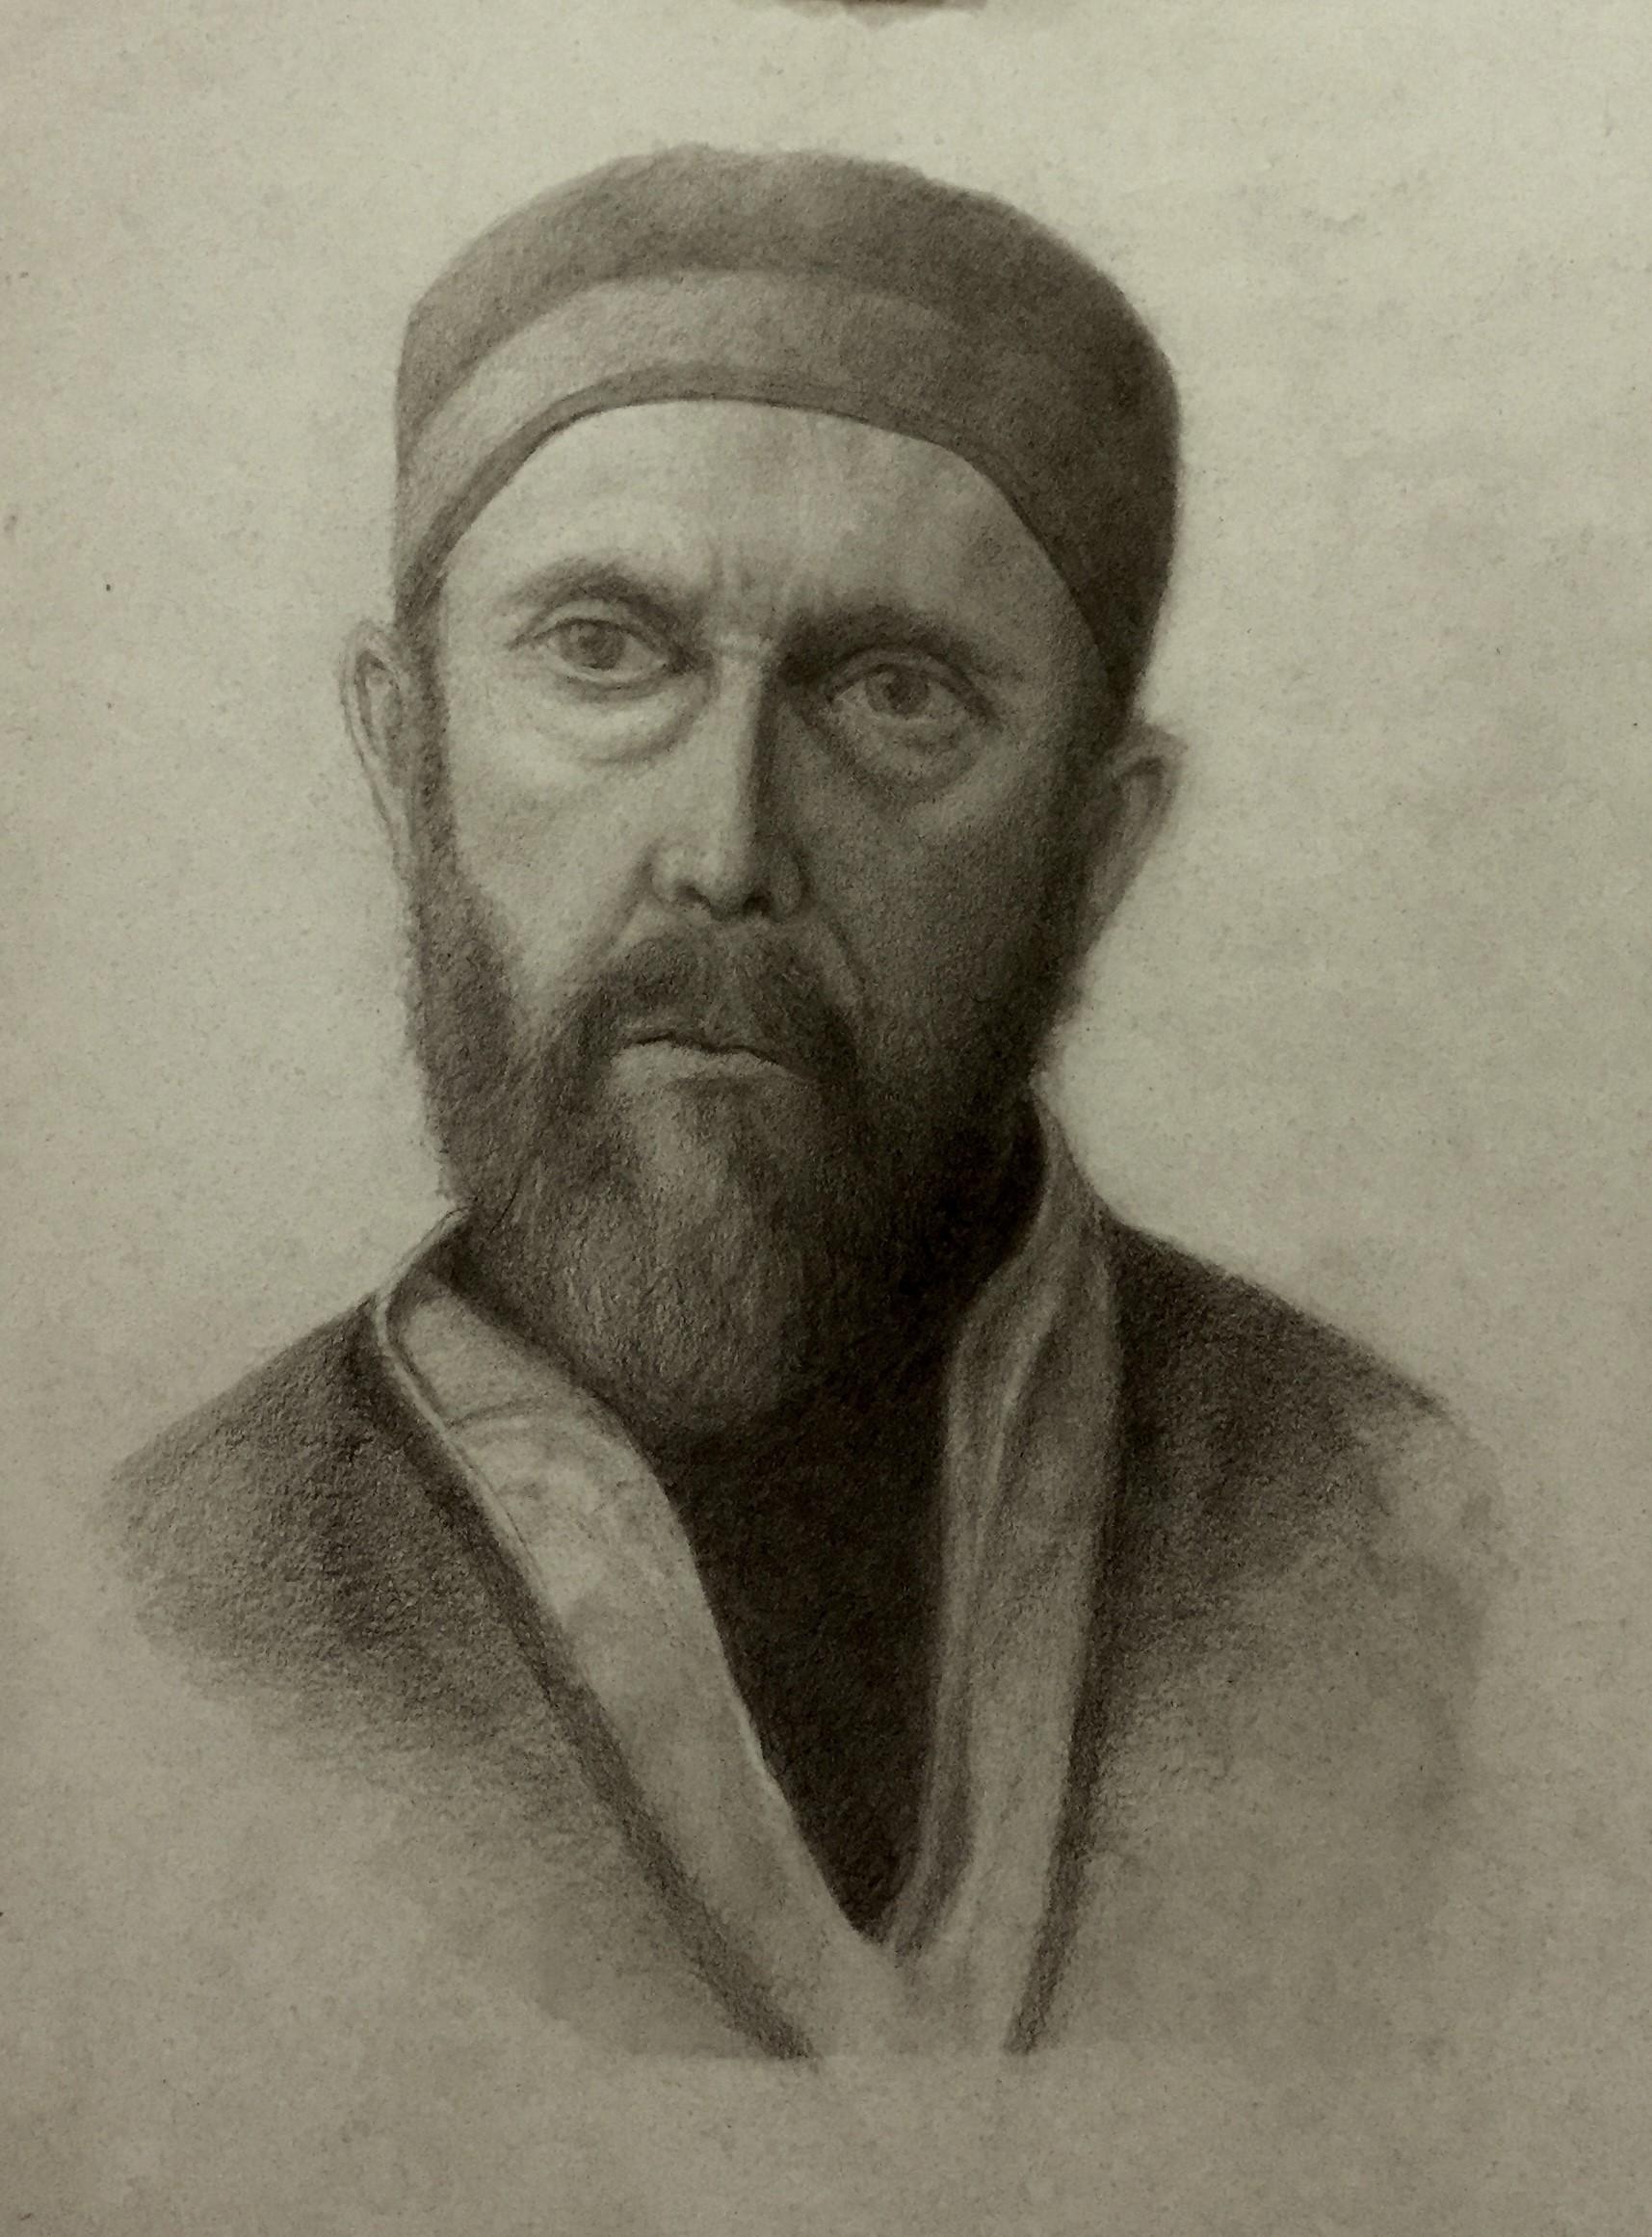 Chayyim Vital